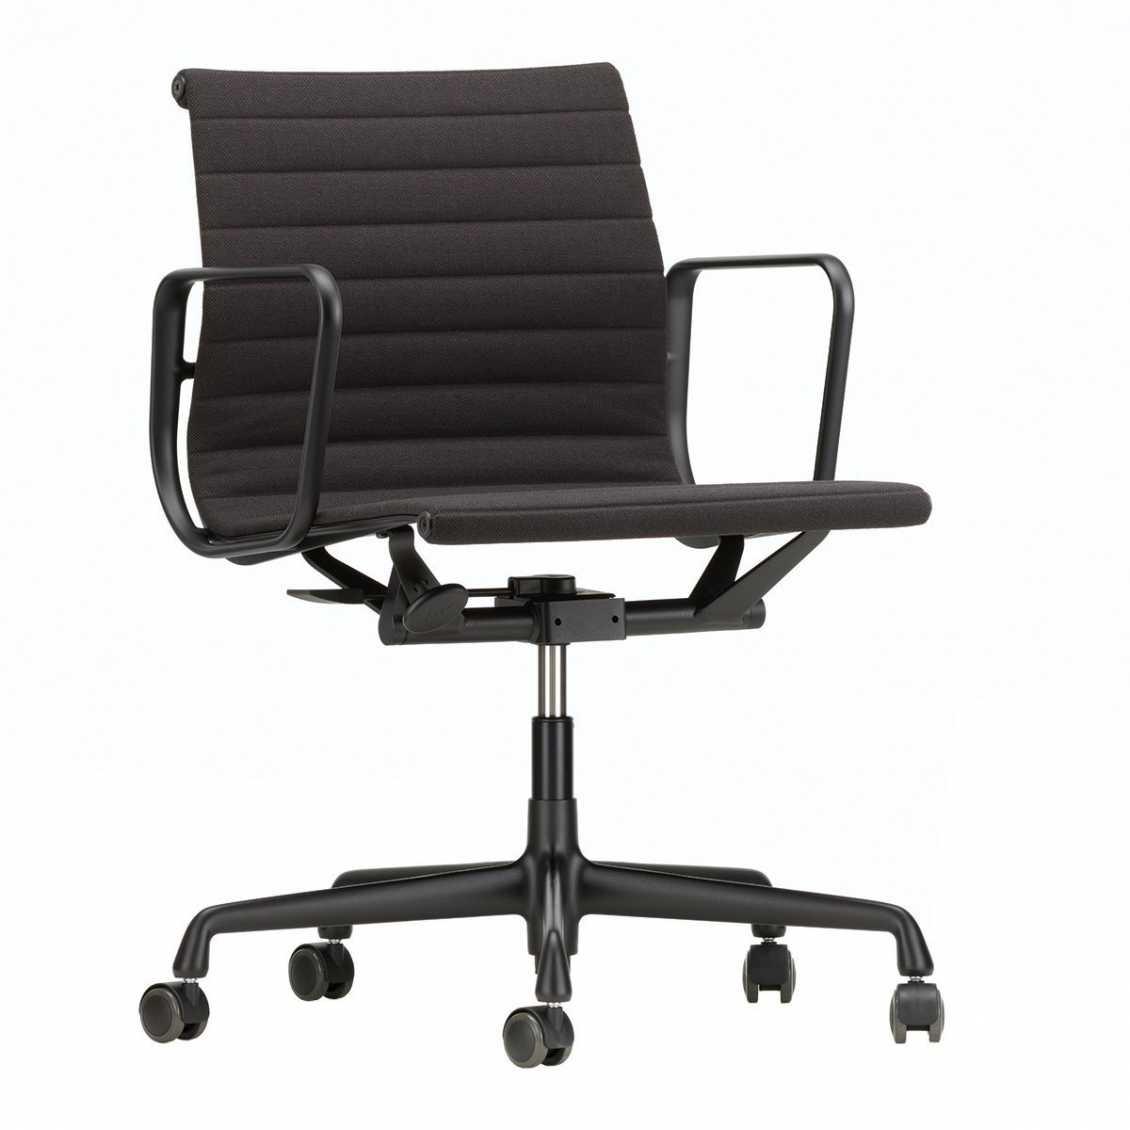 Eames Ea 117 Bureaustoel.Aluminium Chair Ea 117 Nordic New